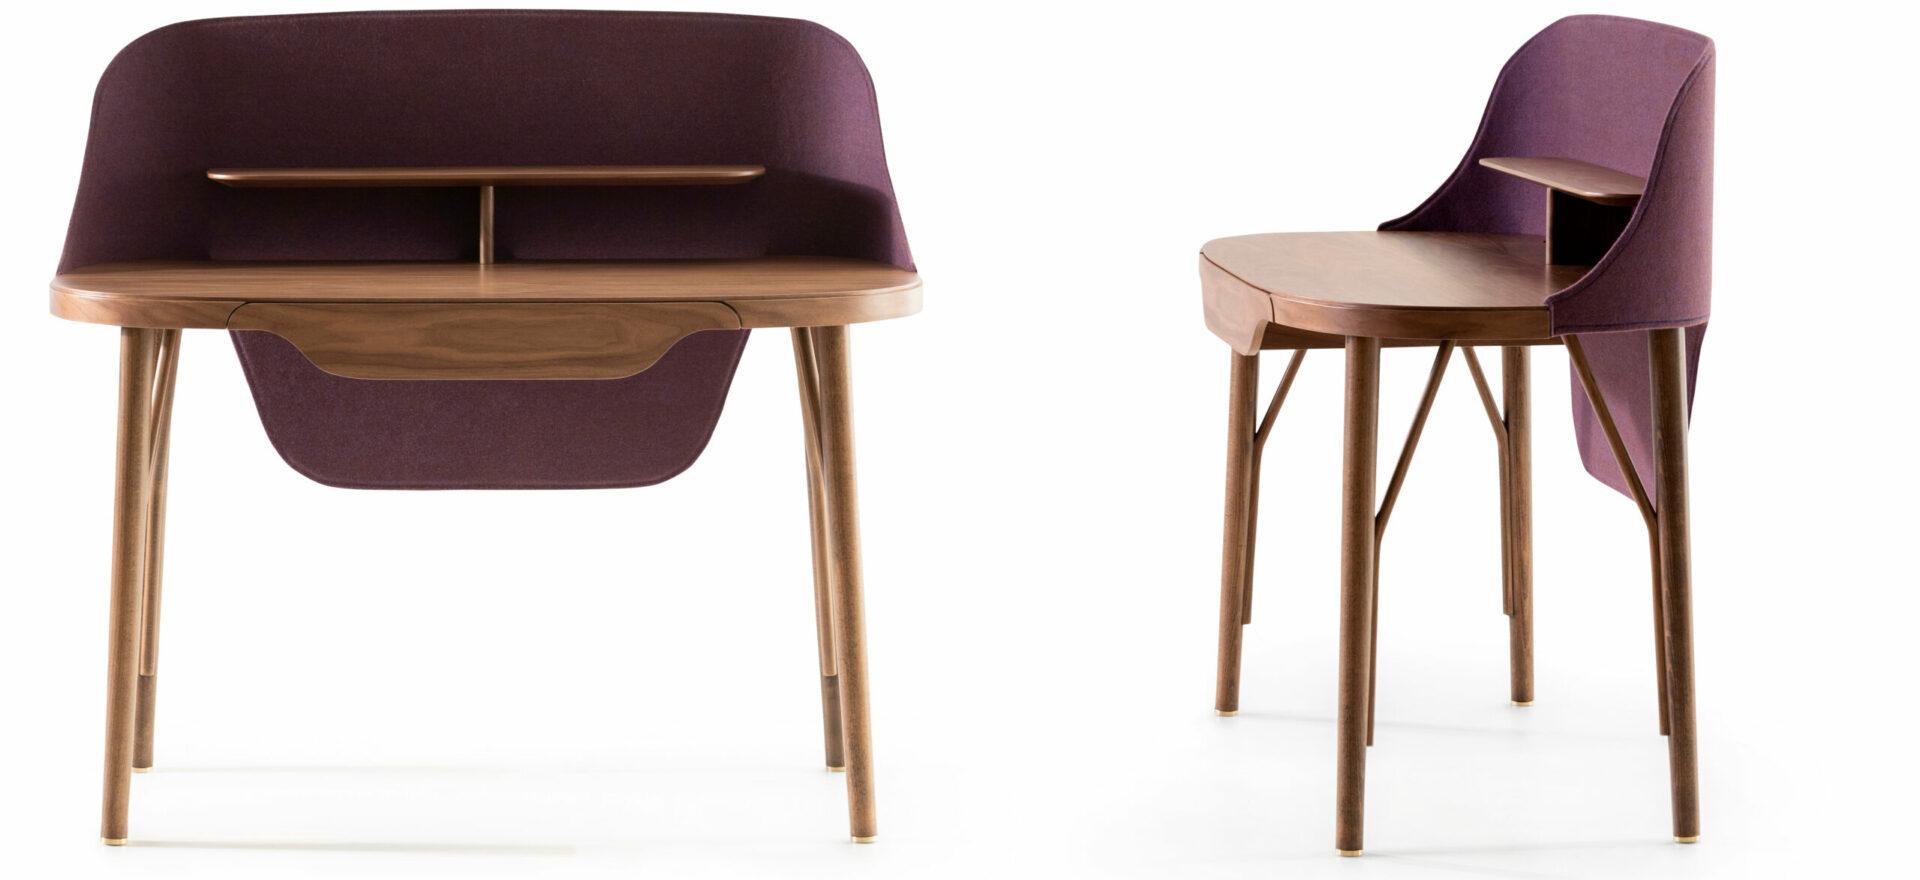 LUNEDI_Addo_workstation_home office_wood and fabric_Mario Trimarchi Design3